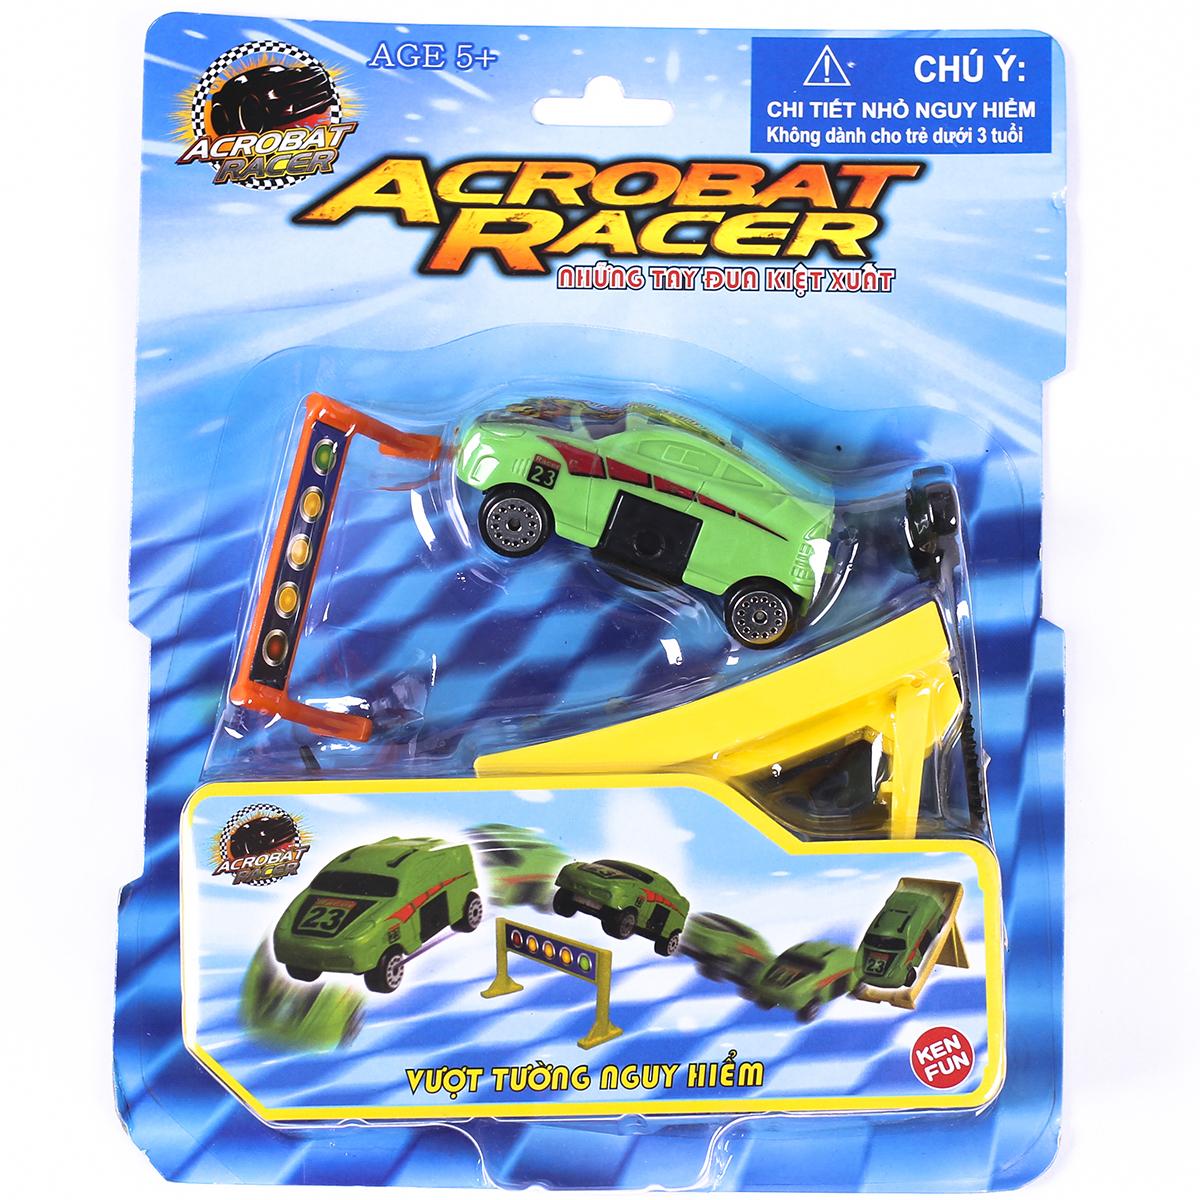 Xe do choi Acrobat Racer - Vuot tuong nguy hiem